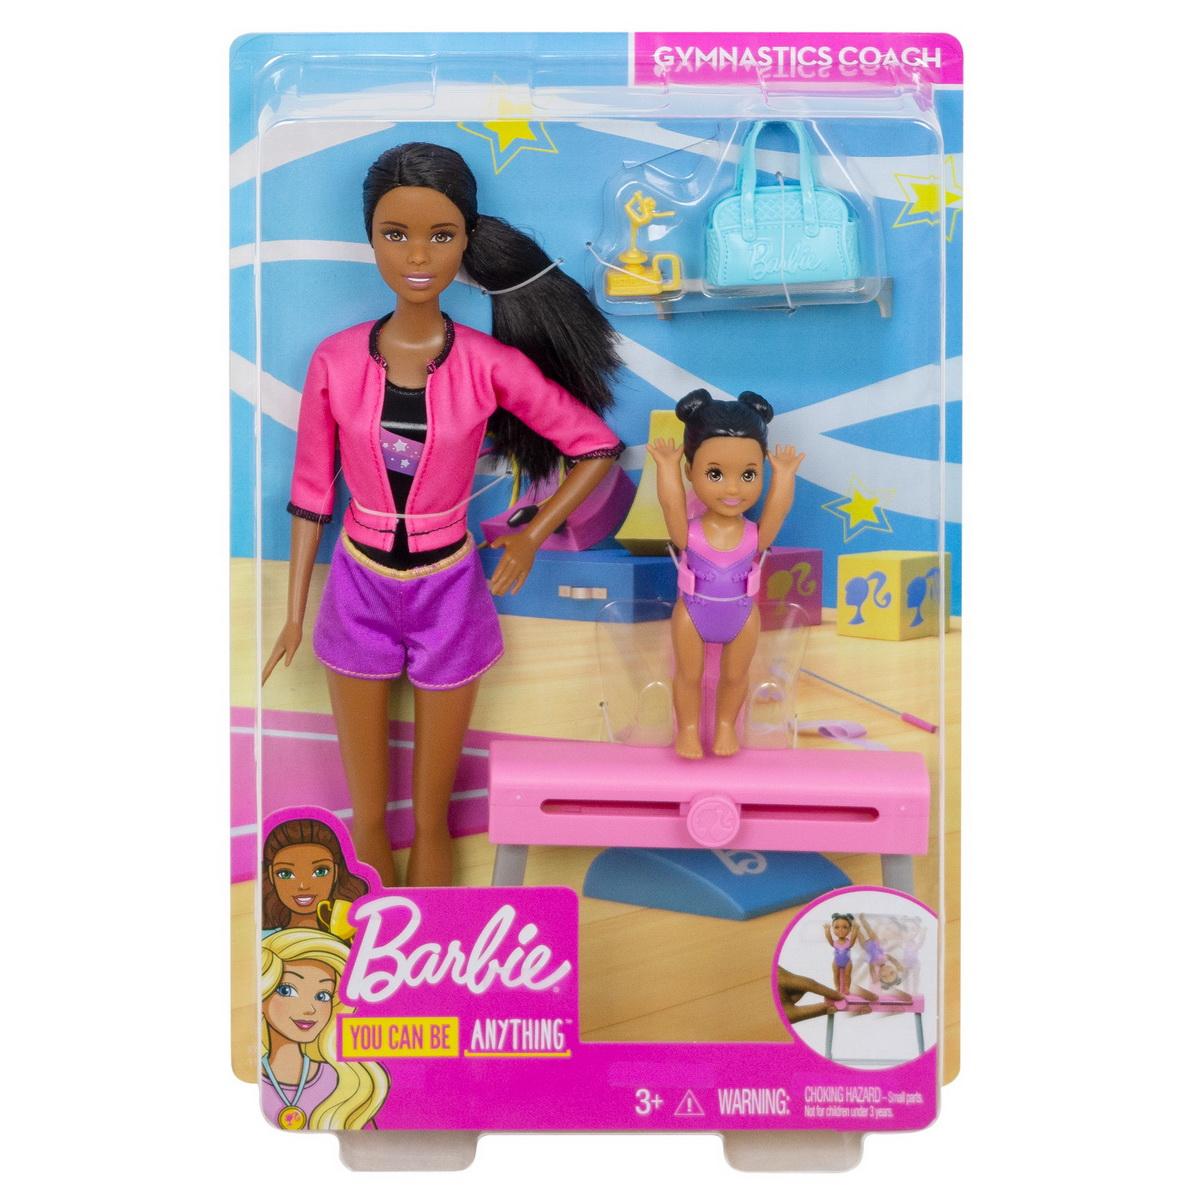 Papusa Barbie Bruneta Cariera In Sport Antrenoare De Gimnastica